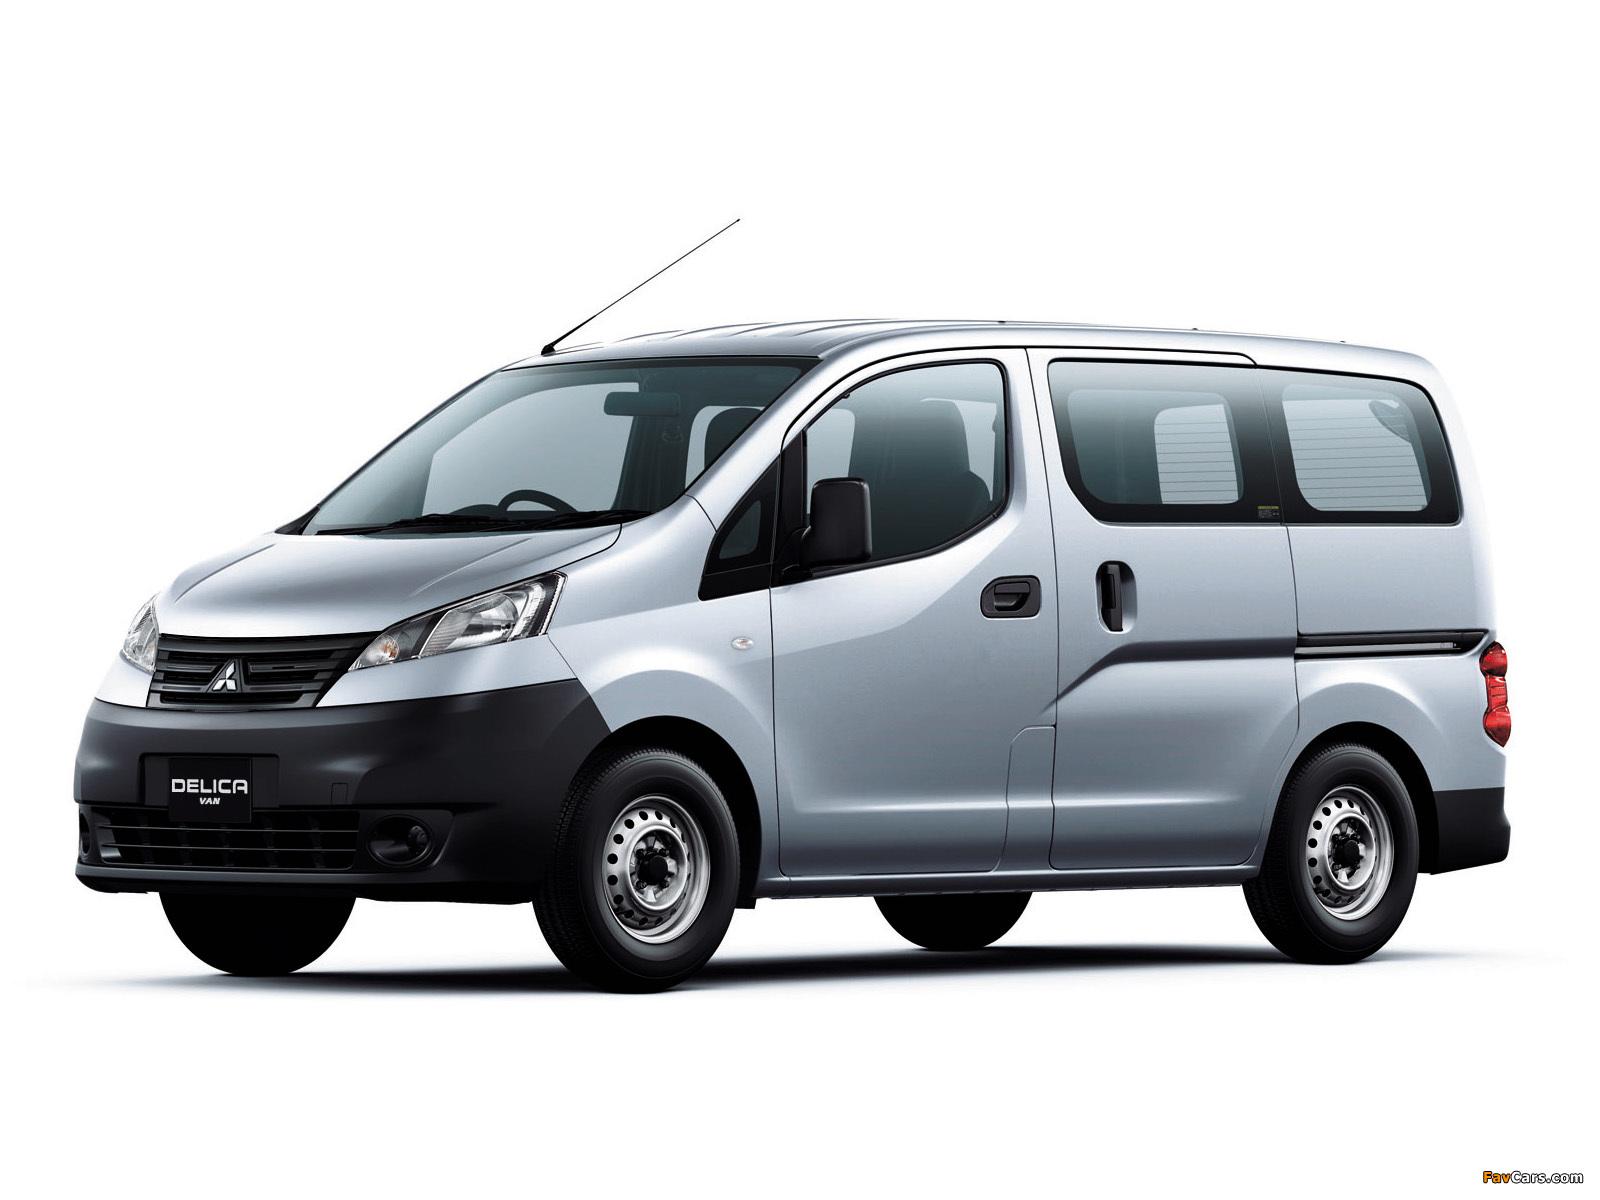 Images Of Mitsubishi Delica Van 2011 1600x1200